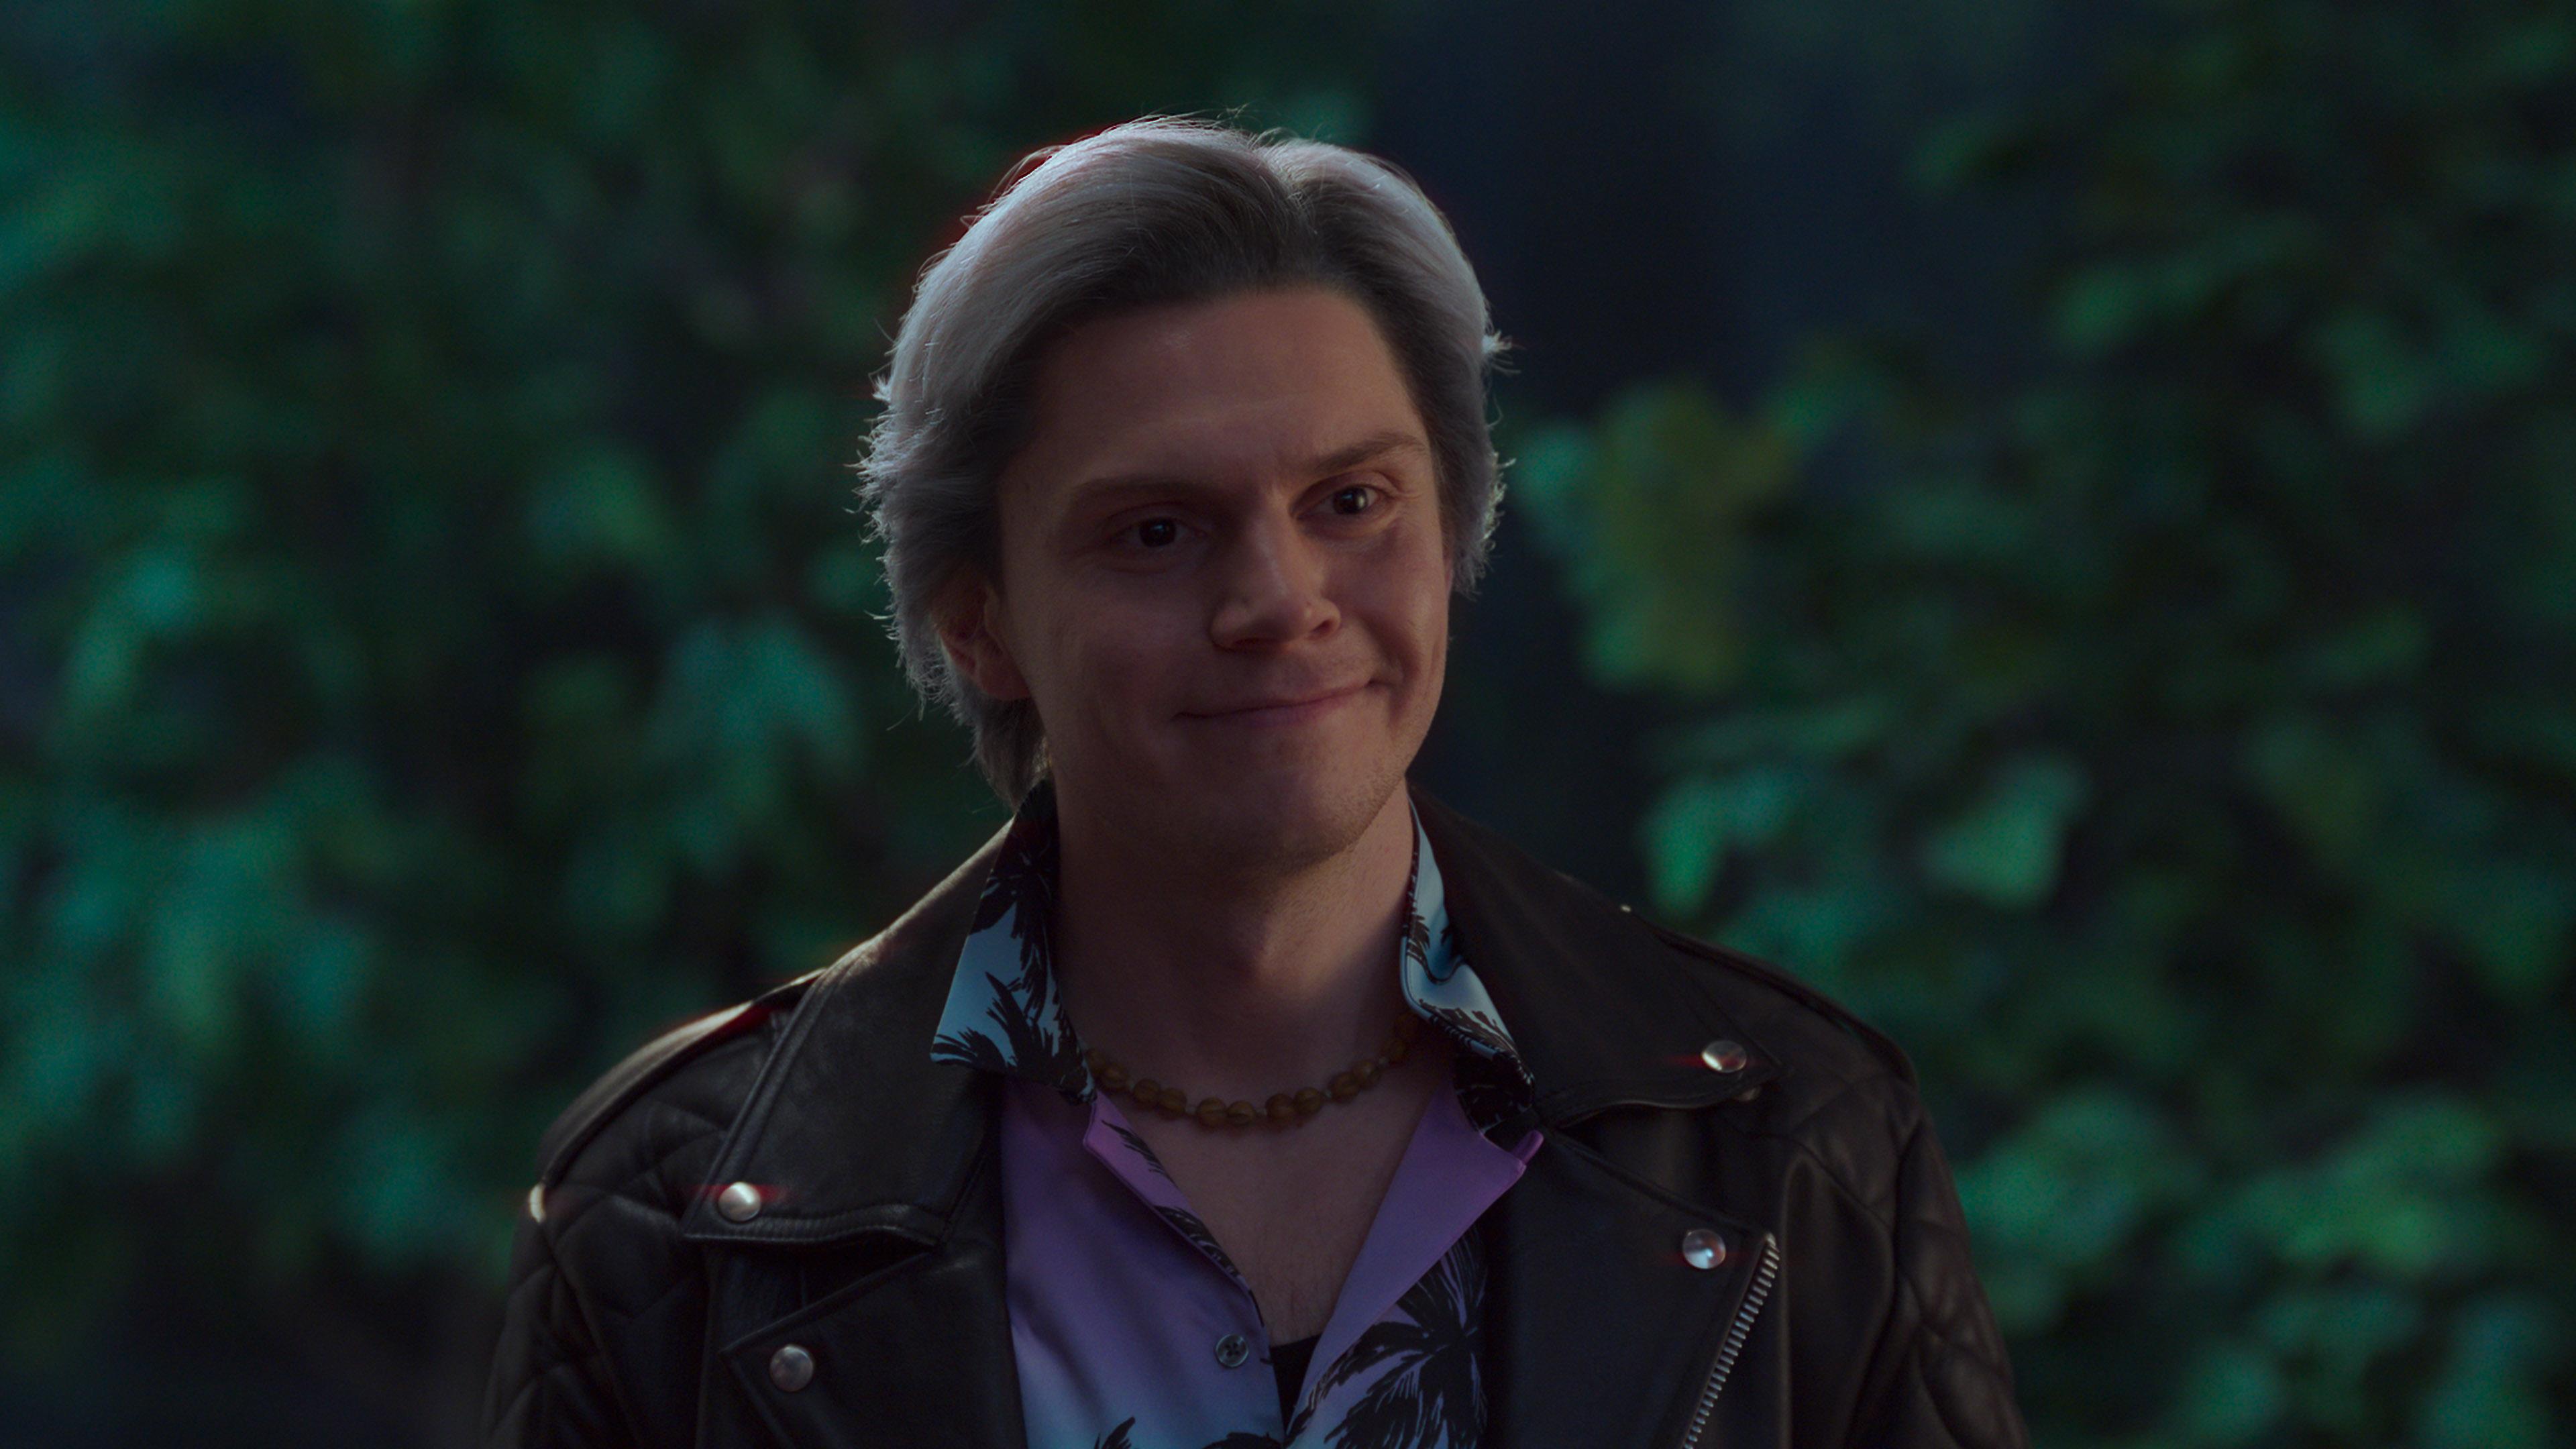 Evan Peters as Pietro in WandaVision